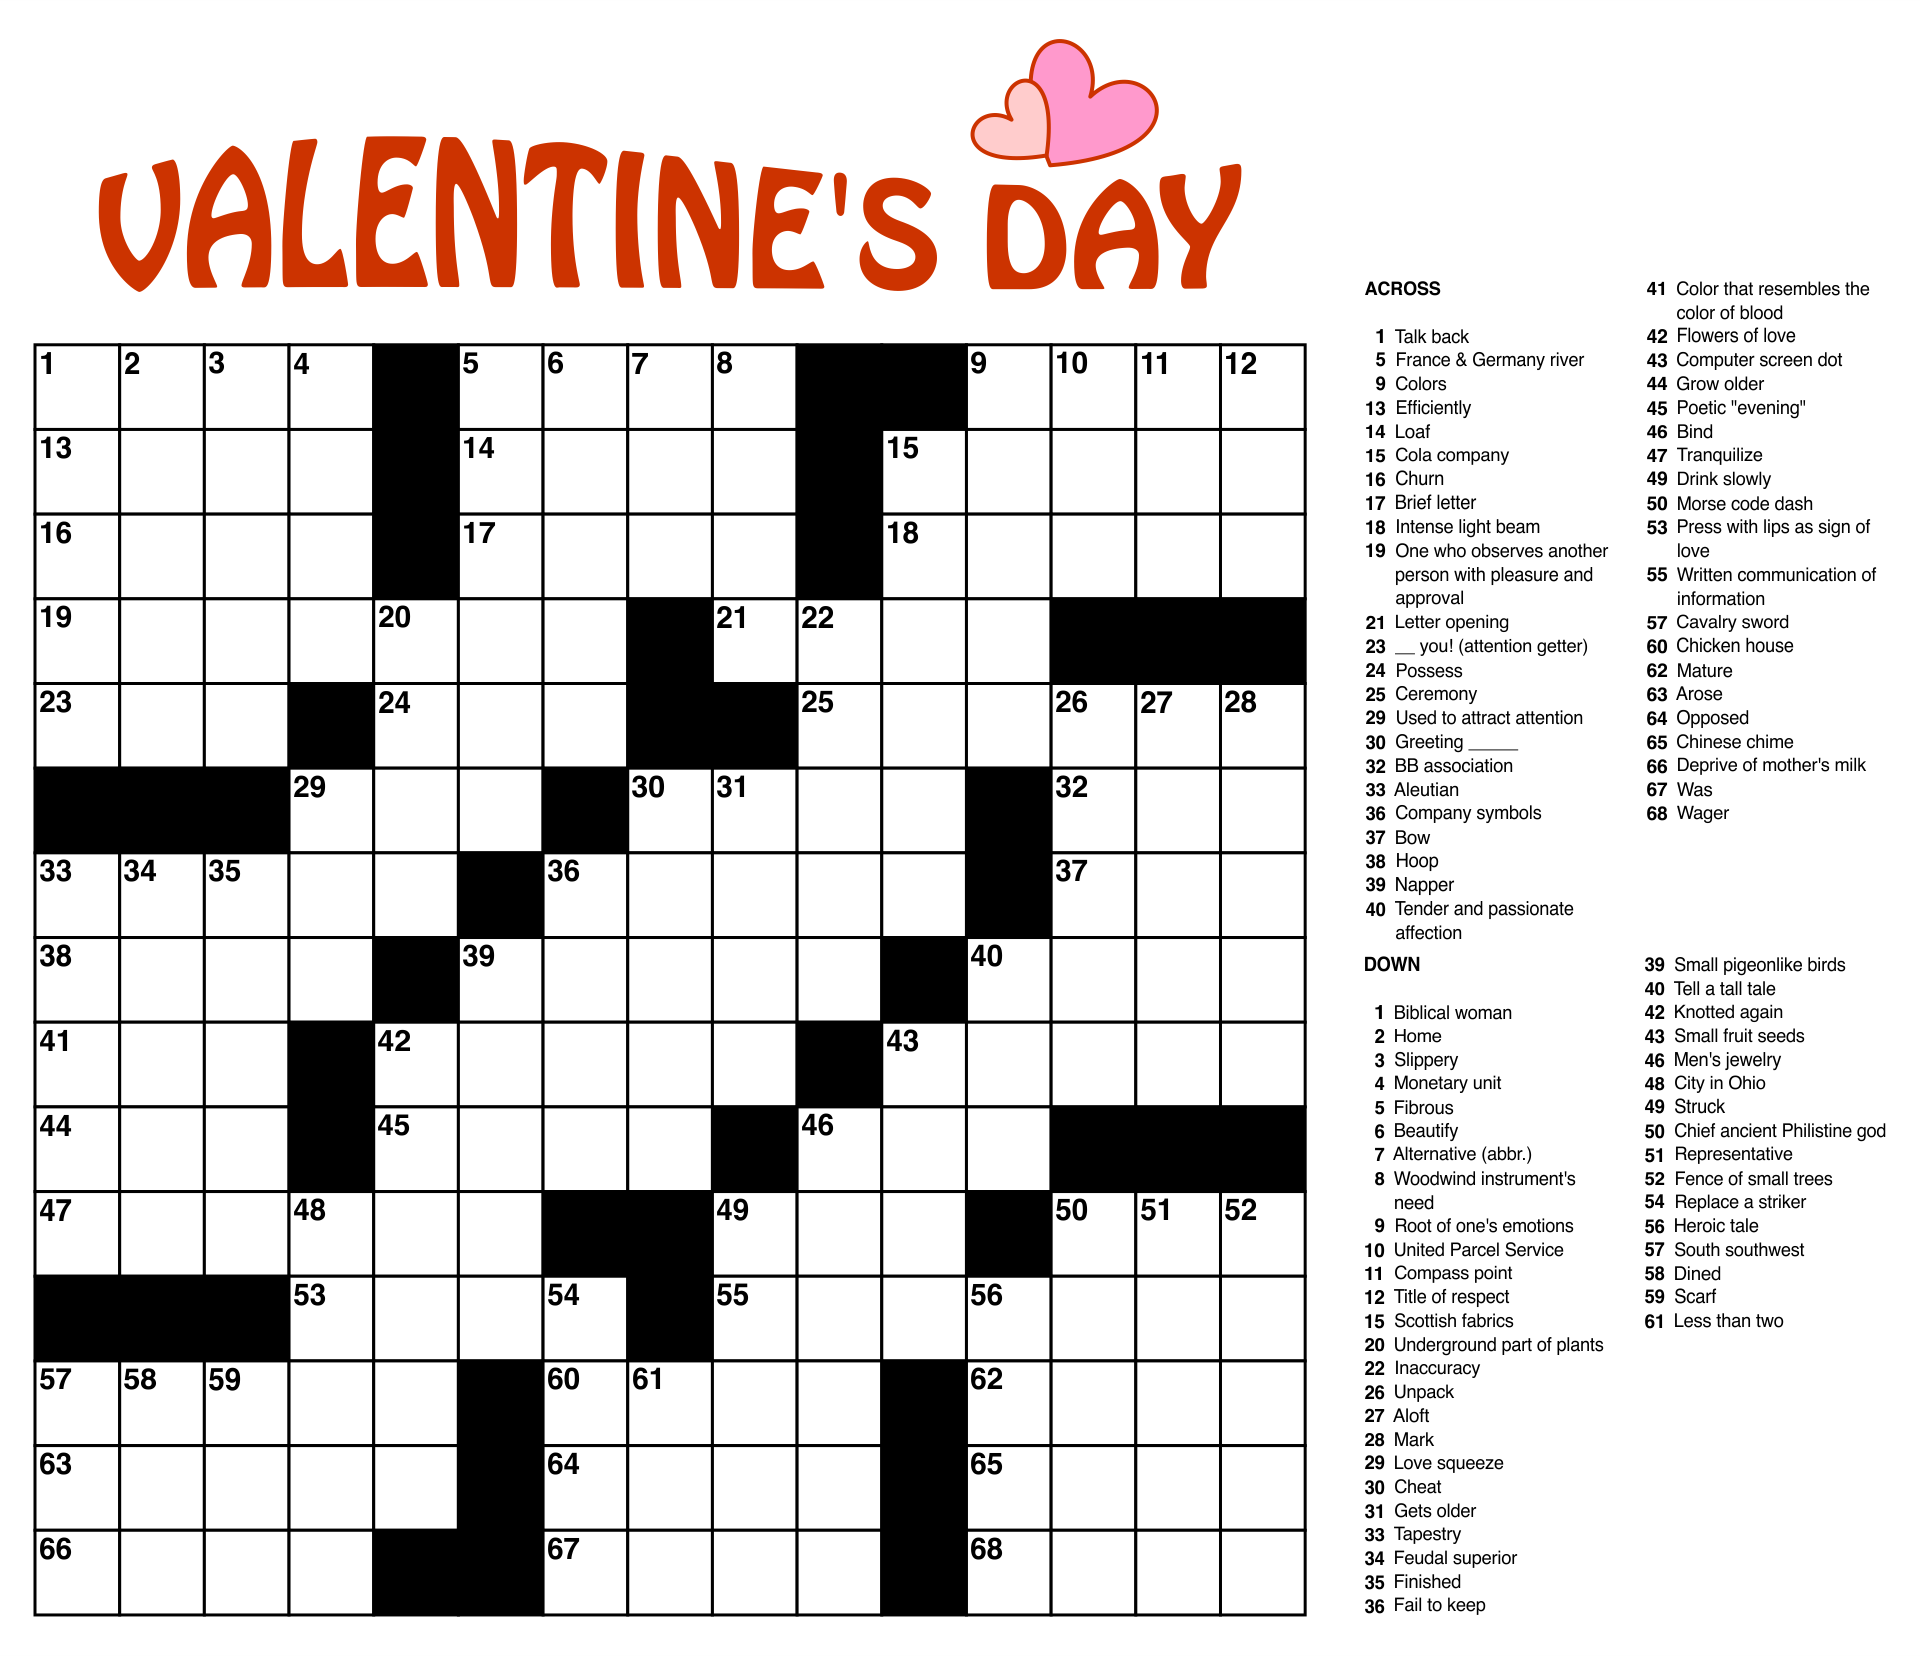 Extra Large Print Crossword Puzzles